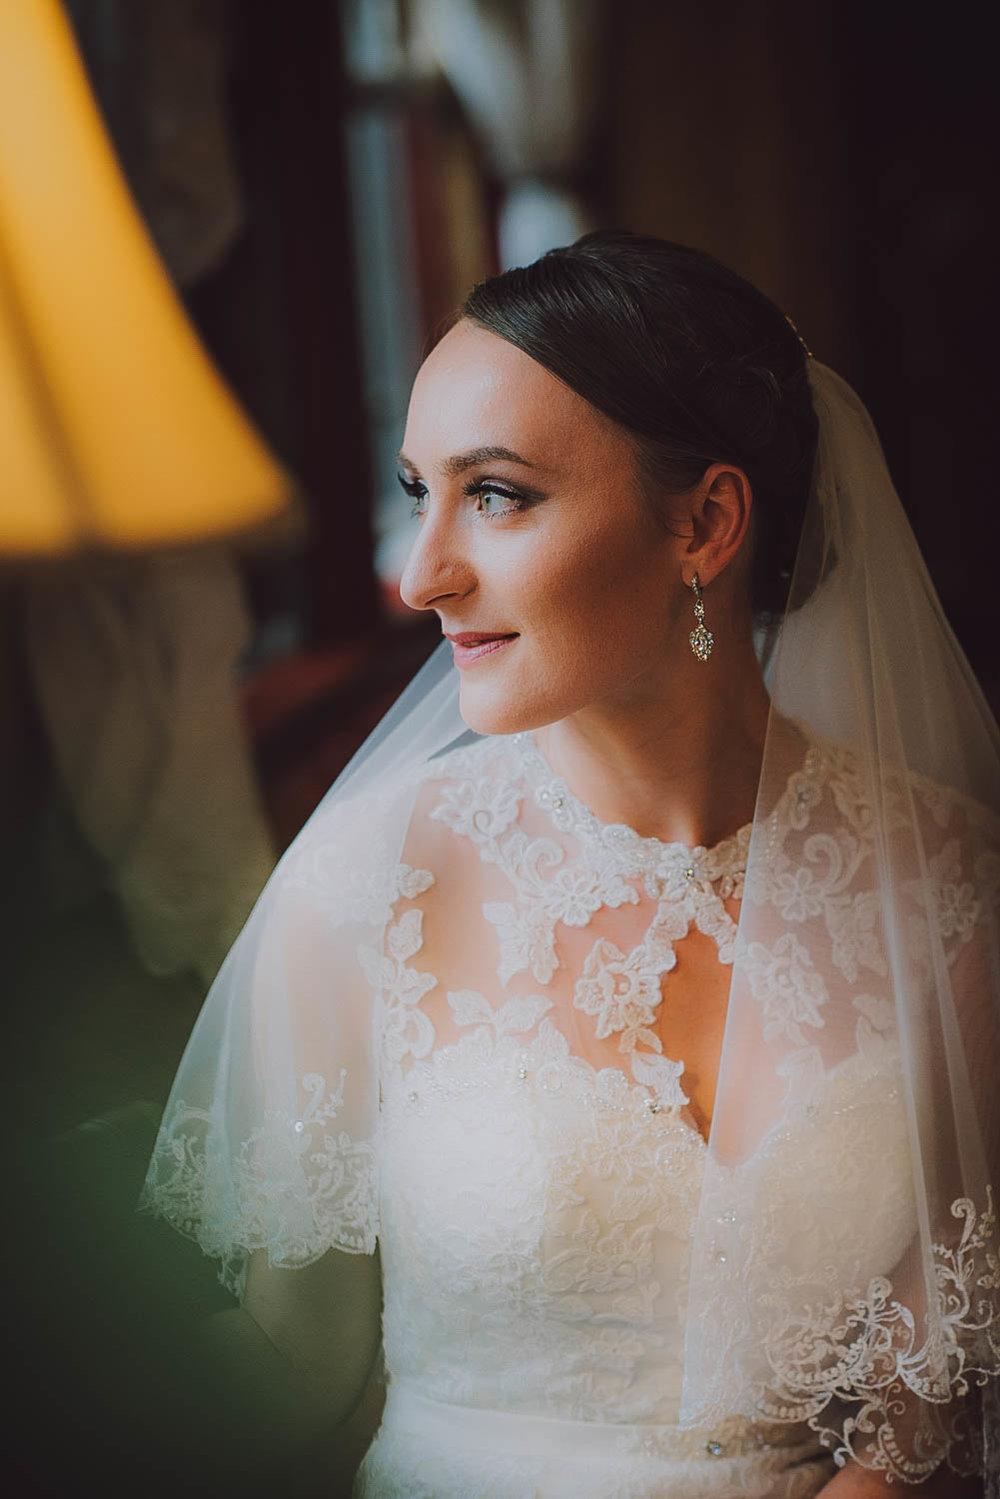 ecaterina-chandu-dondeti-wedding-photography18.jpg